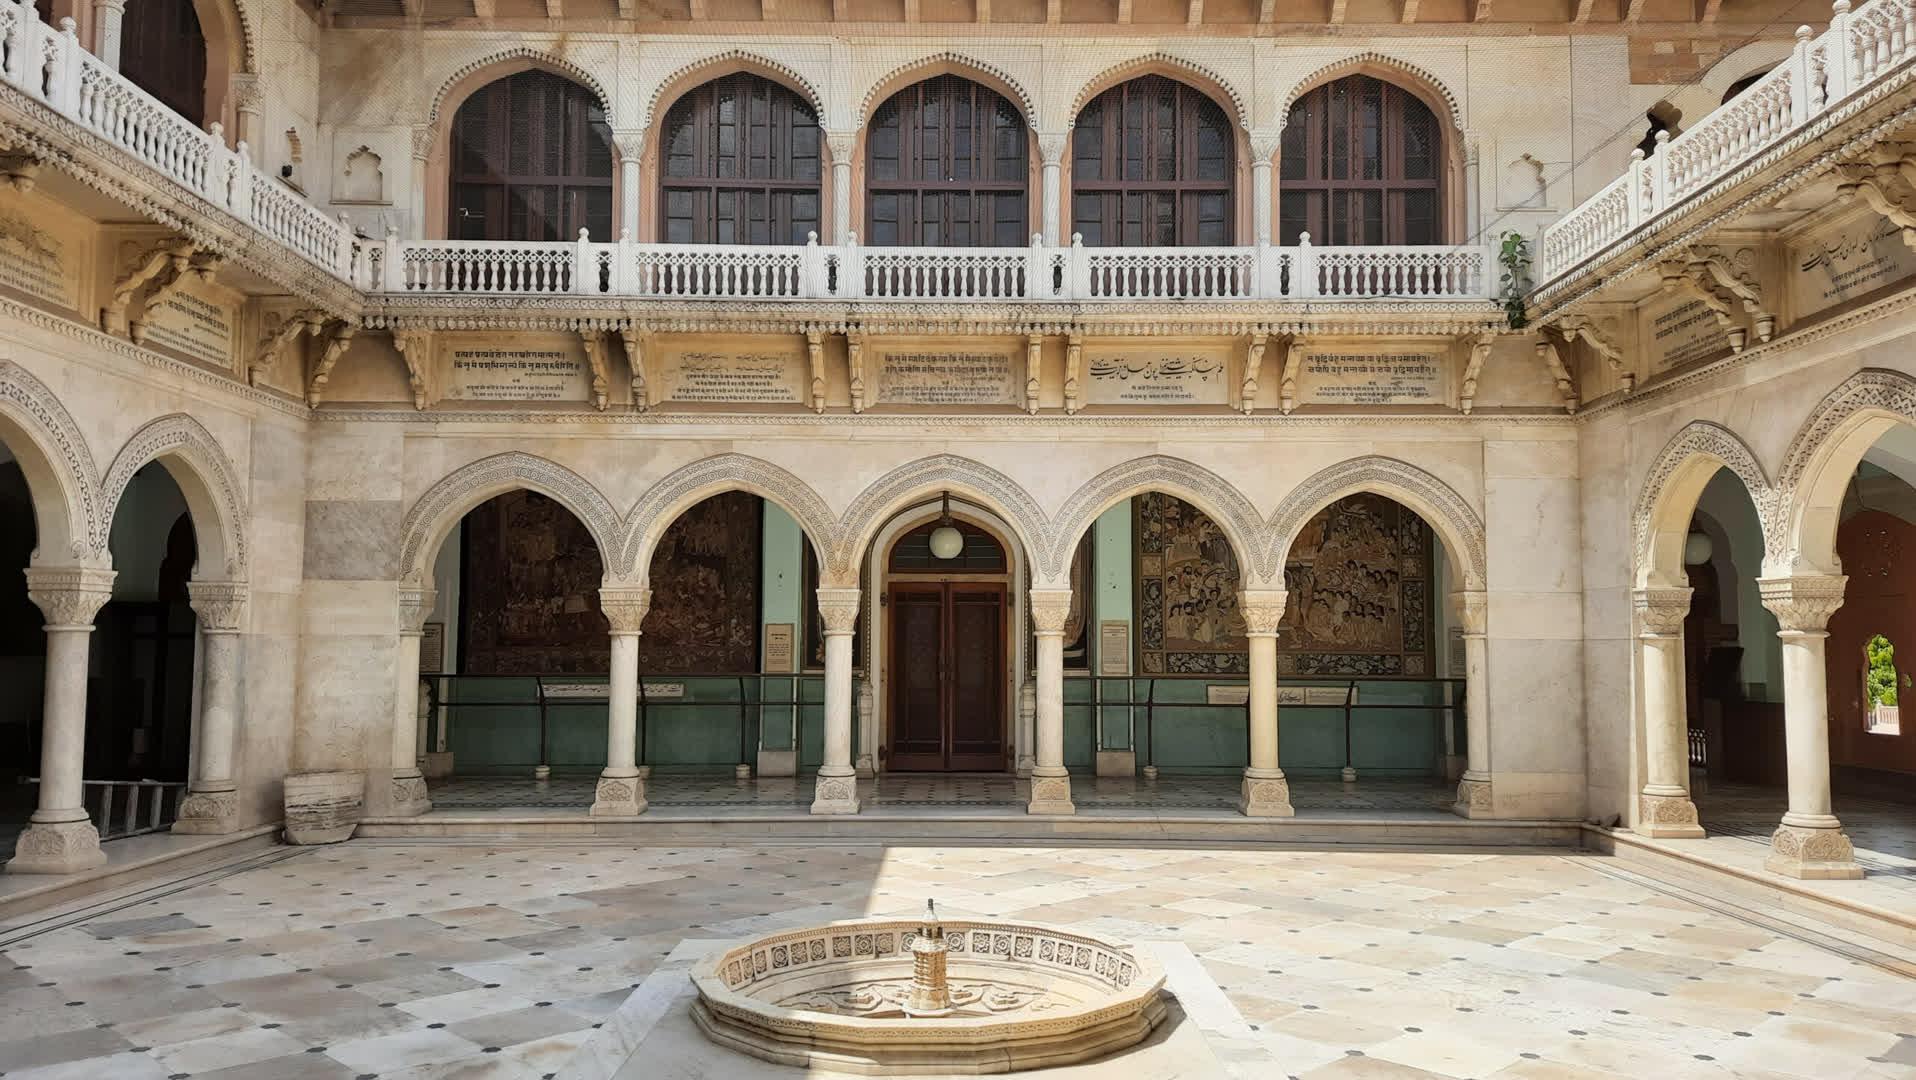 The courtyard of Albert Hall Museum in Jaipur, designed by Samuel Swinton Jacob   LHI